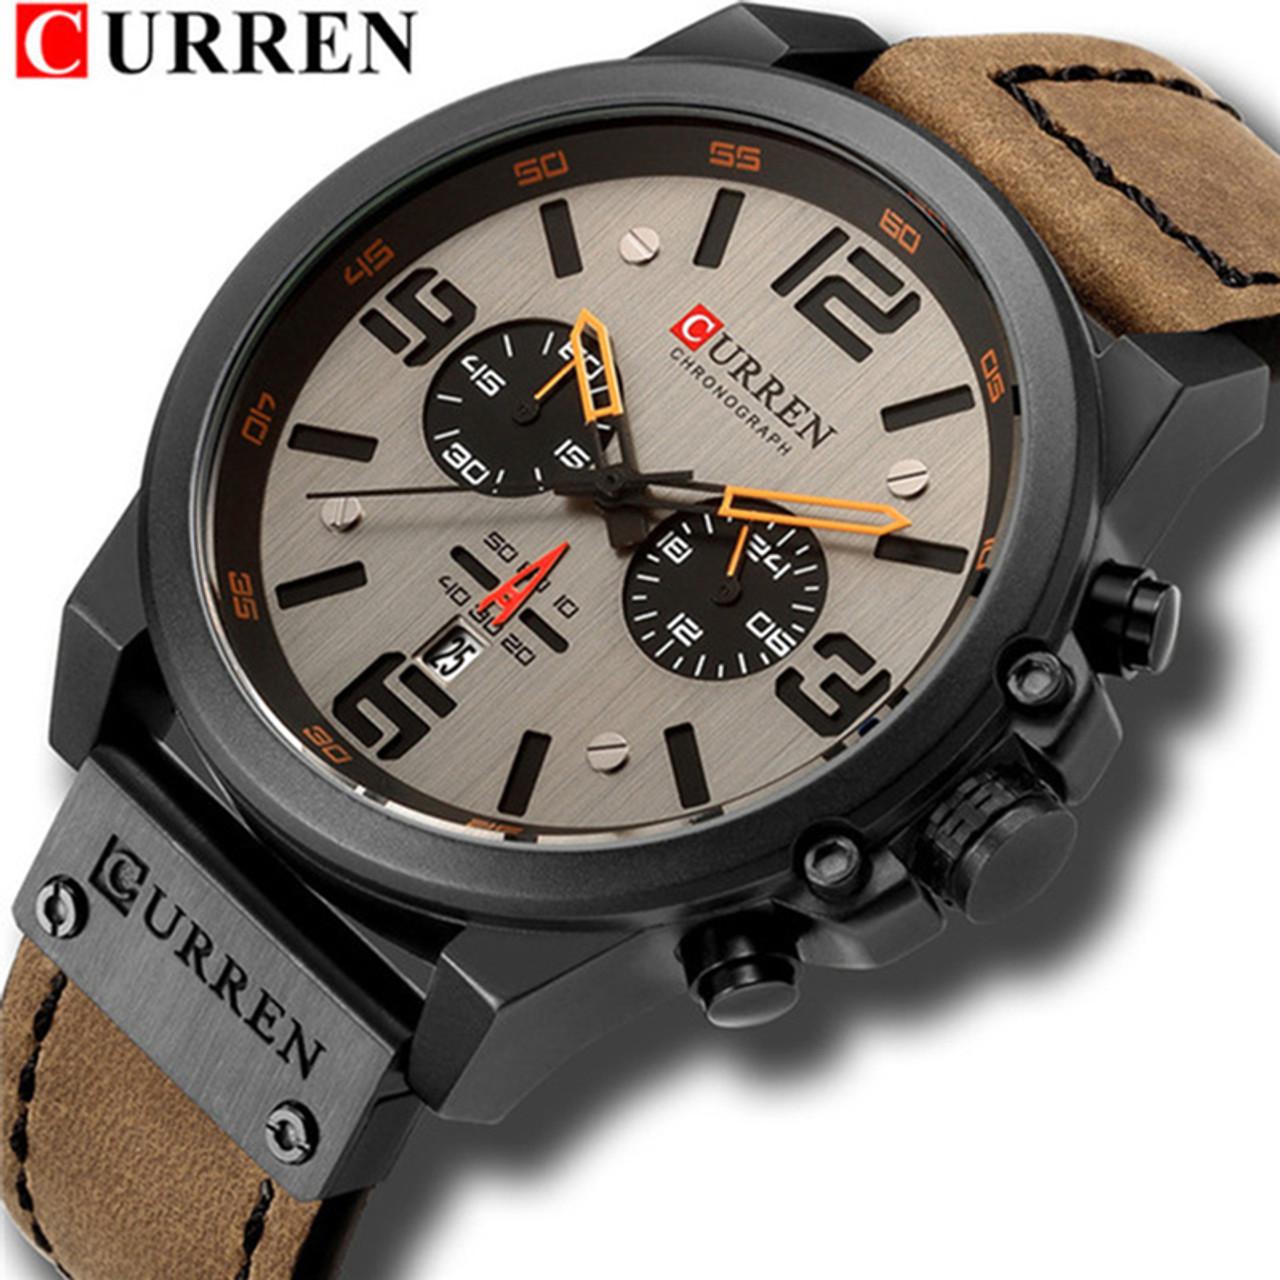 New curren 8314 Mens Watches Top Brand Luxury Men Military Sport Wristwatch  Leather Quartz Watch erkek ... 8363614bc4a